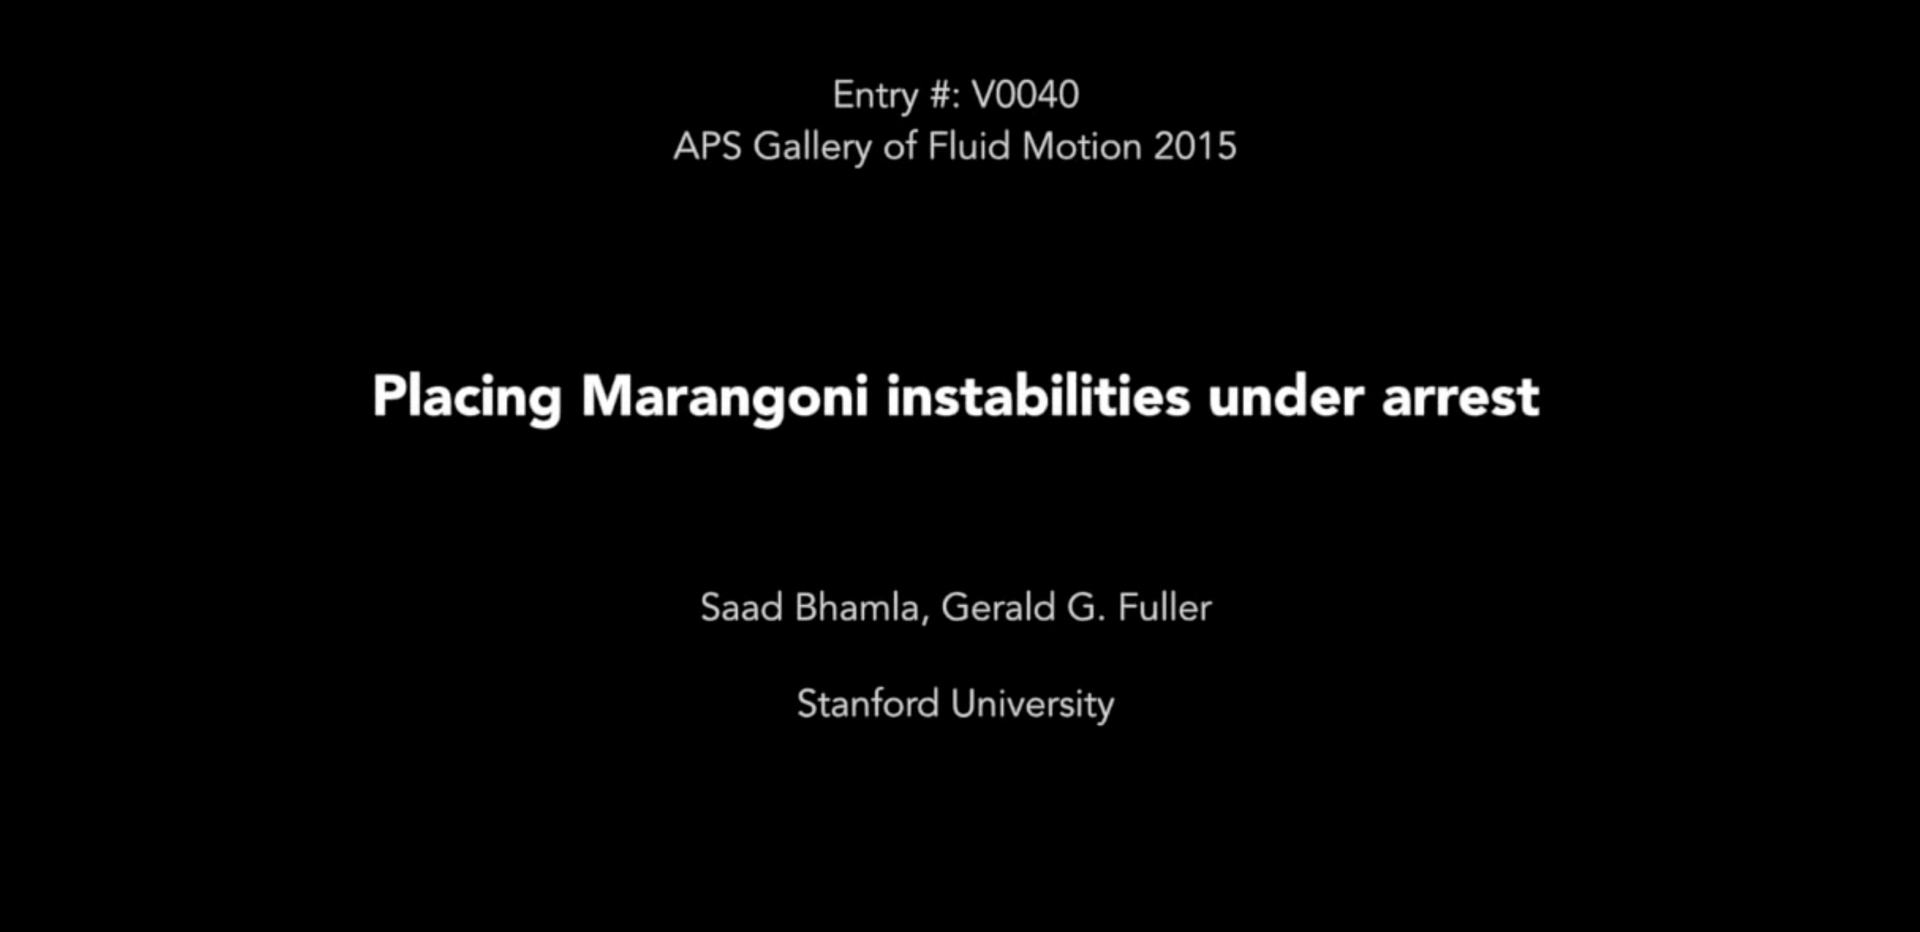 Milton van Dyke award video at APS-DFD Gallery of Fluid Motion (2015)